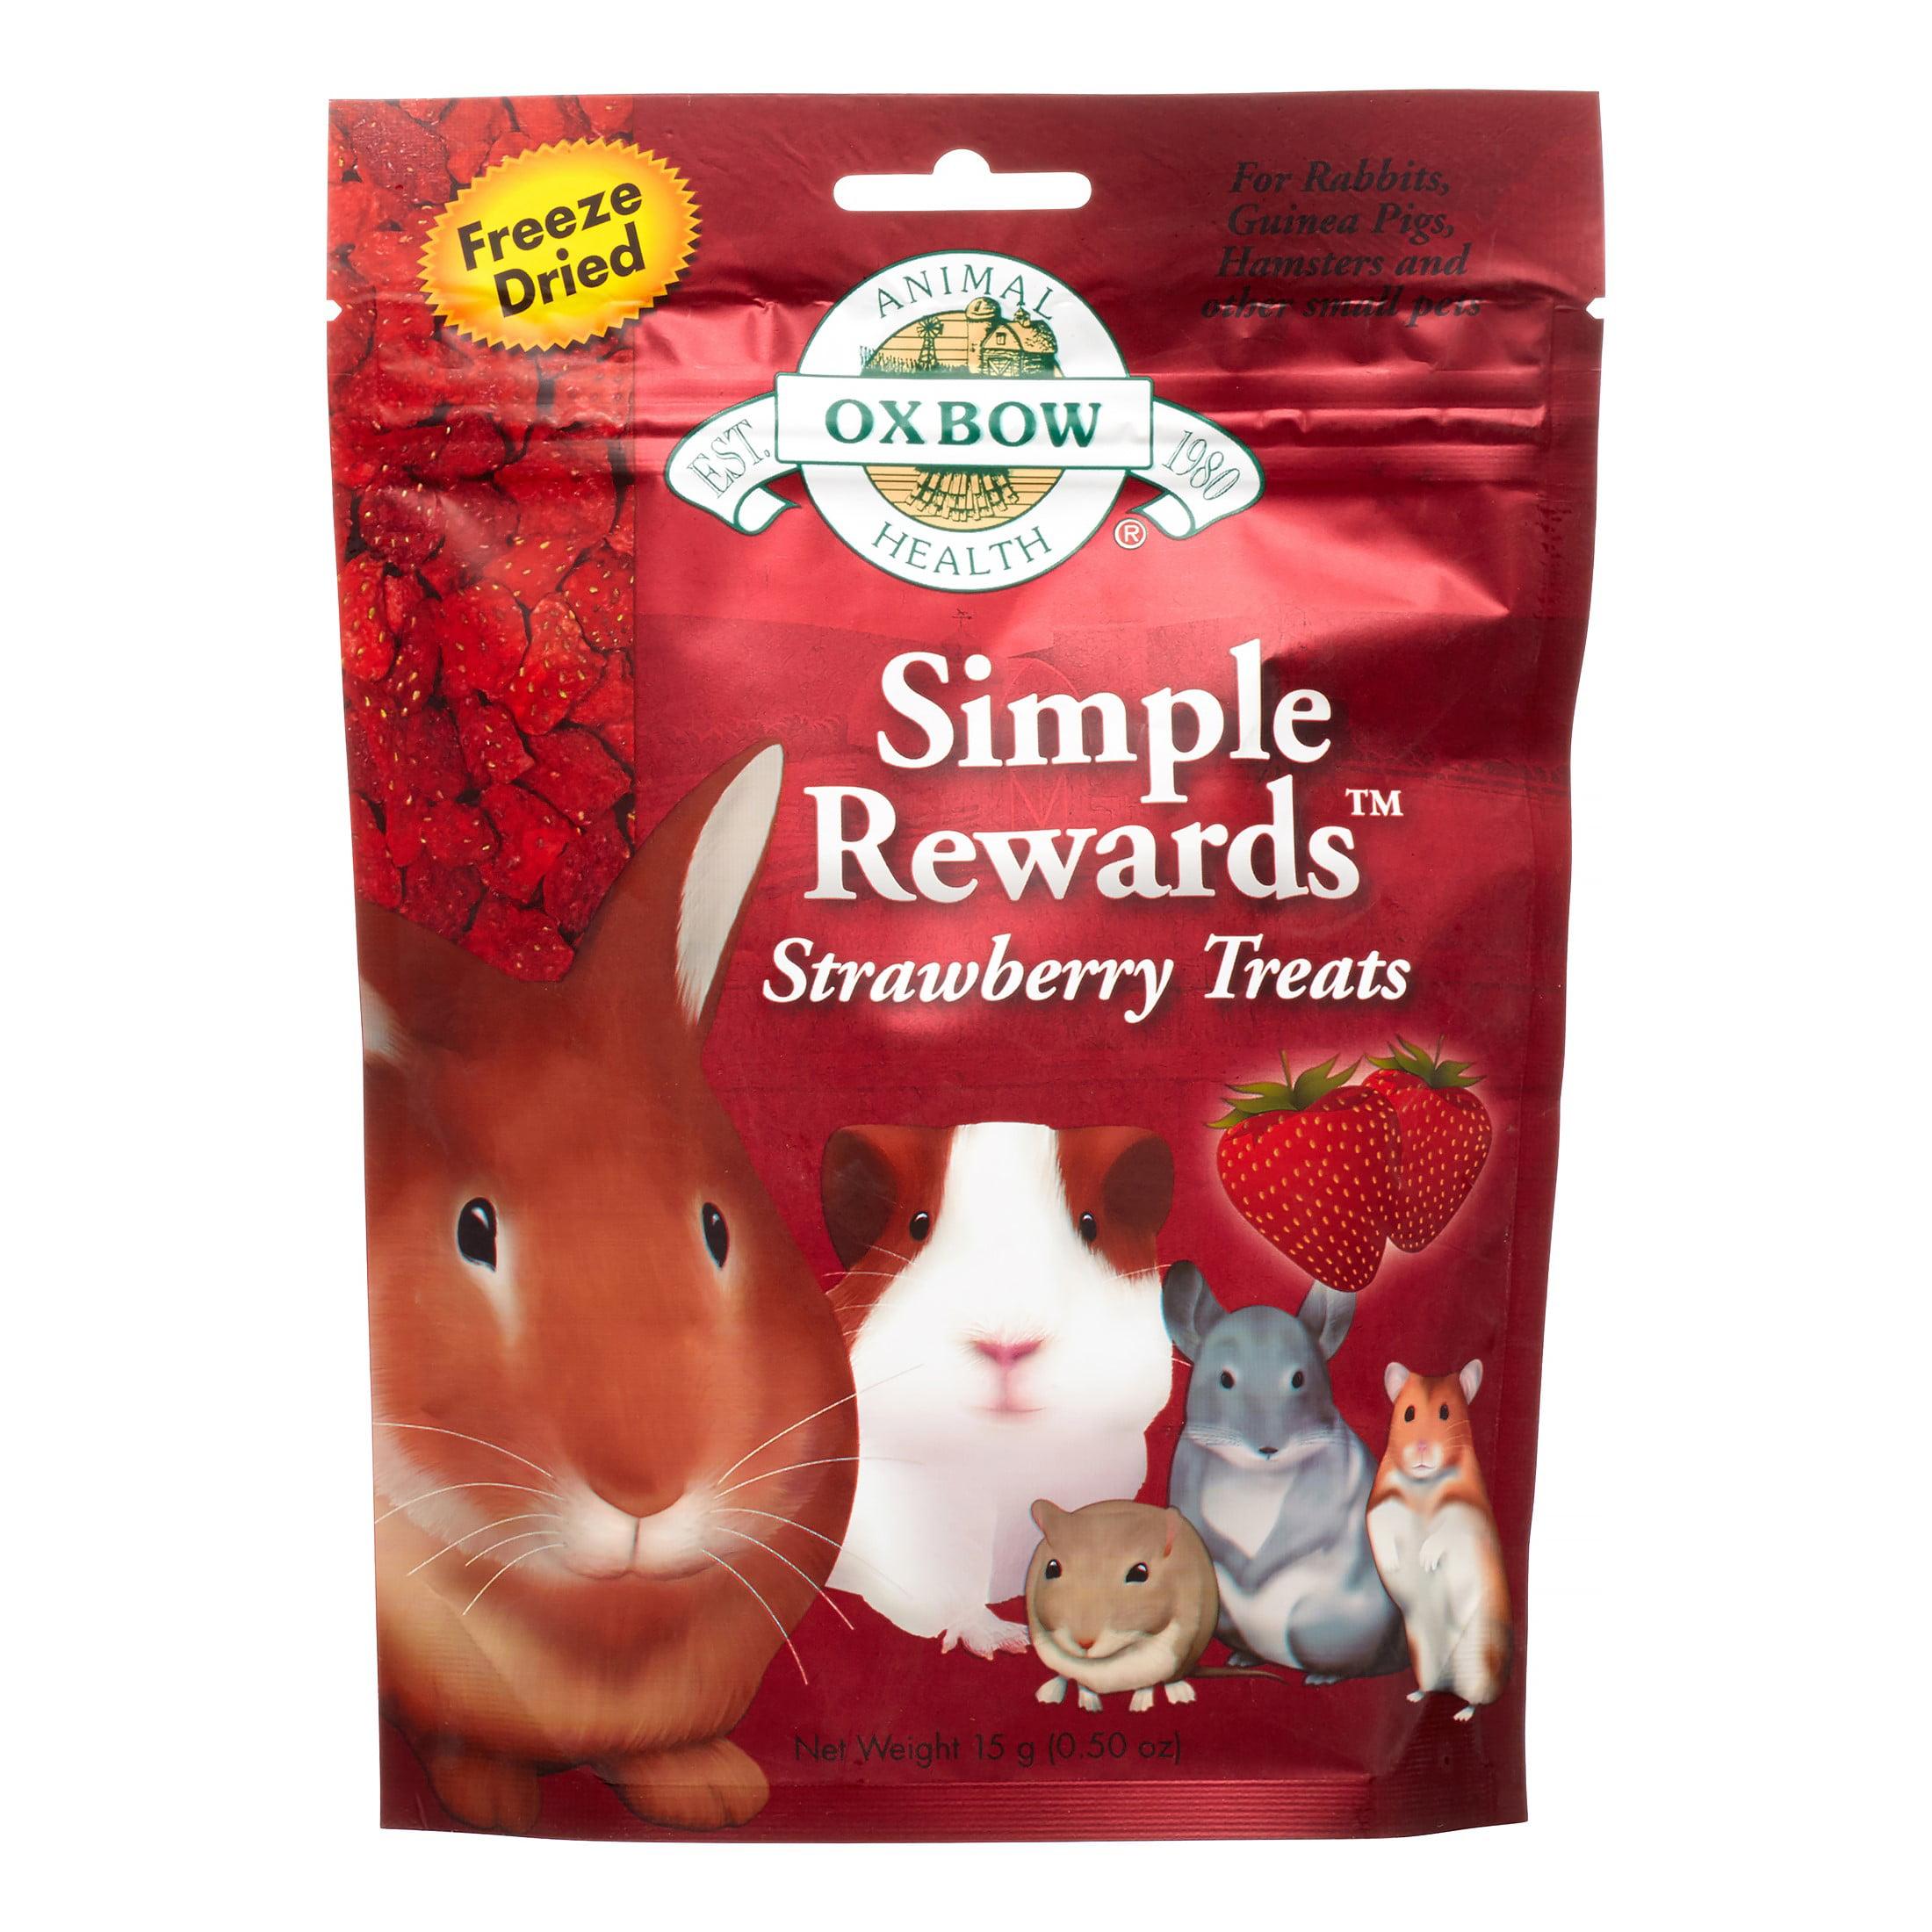 Oxbow Simple Rewards Strawberry Treats for Small Animals, 0.5 oz.